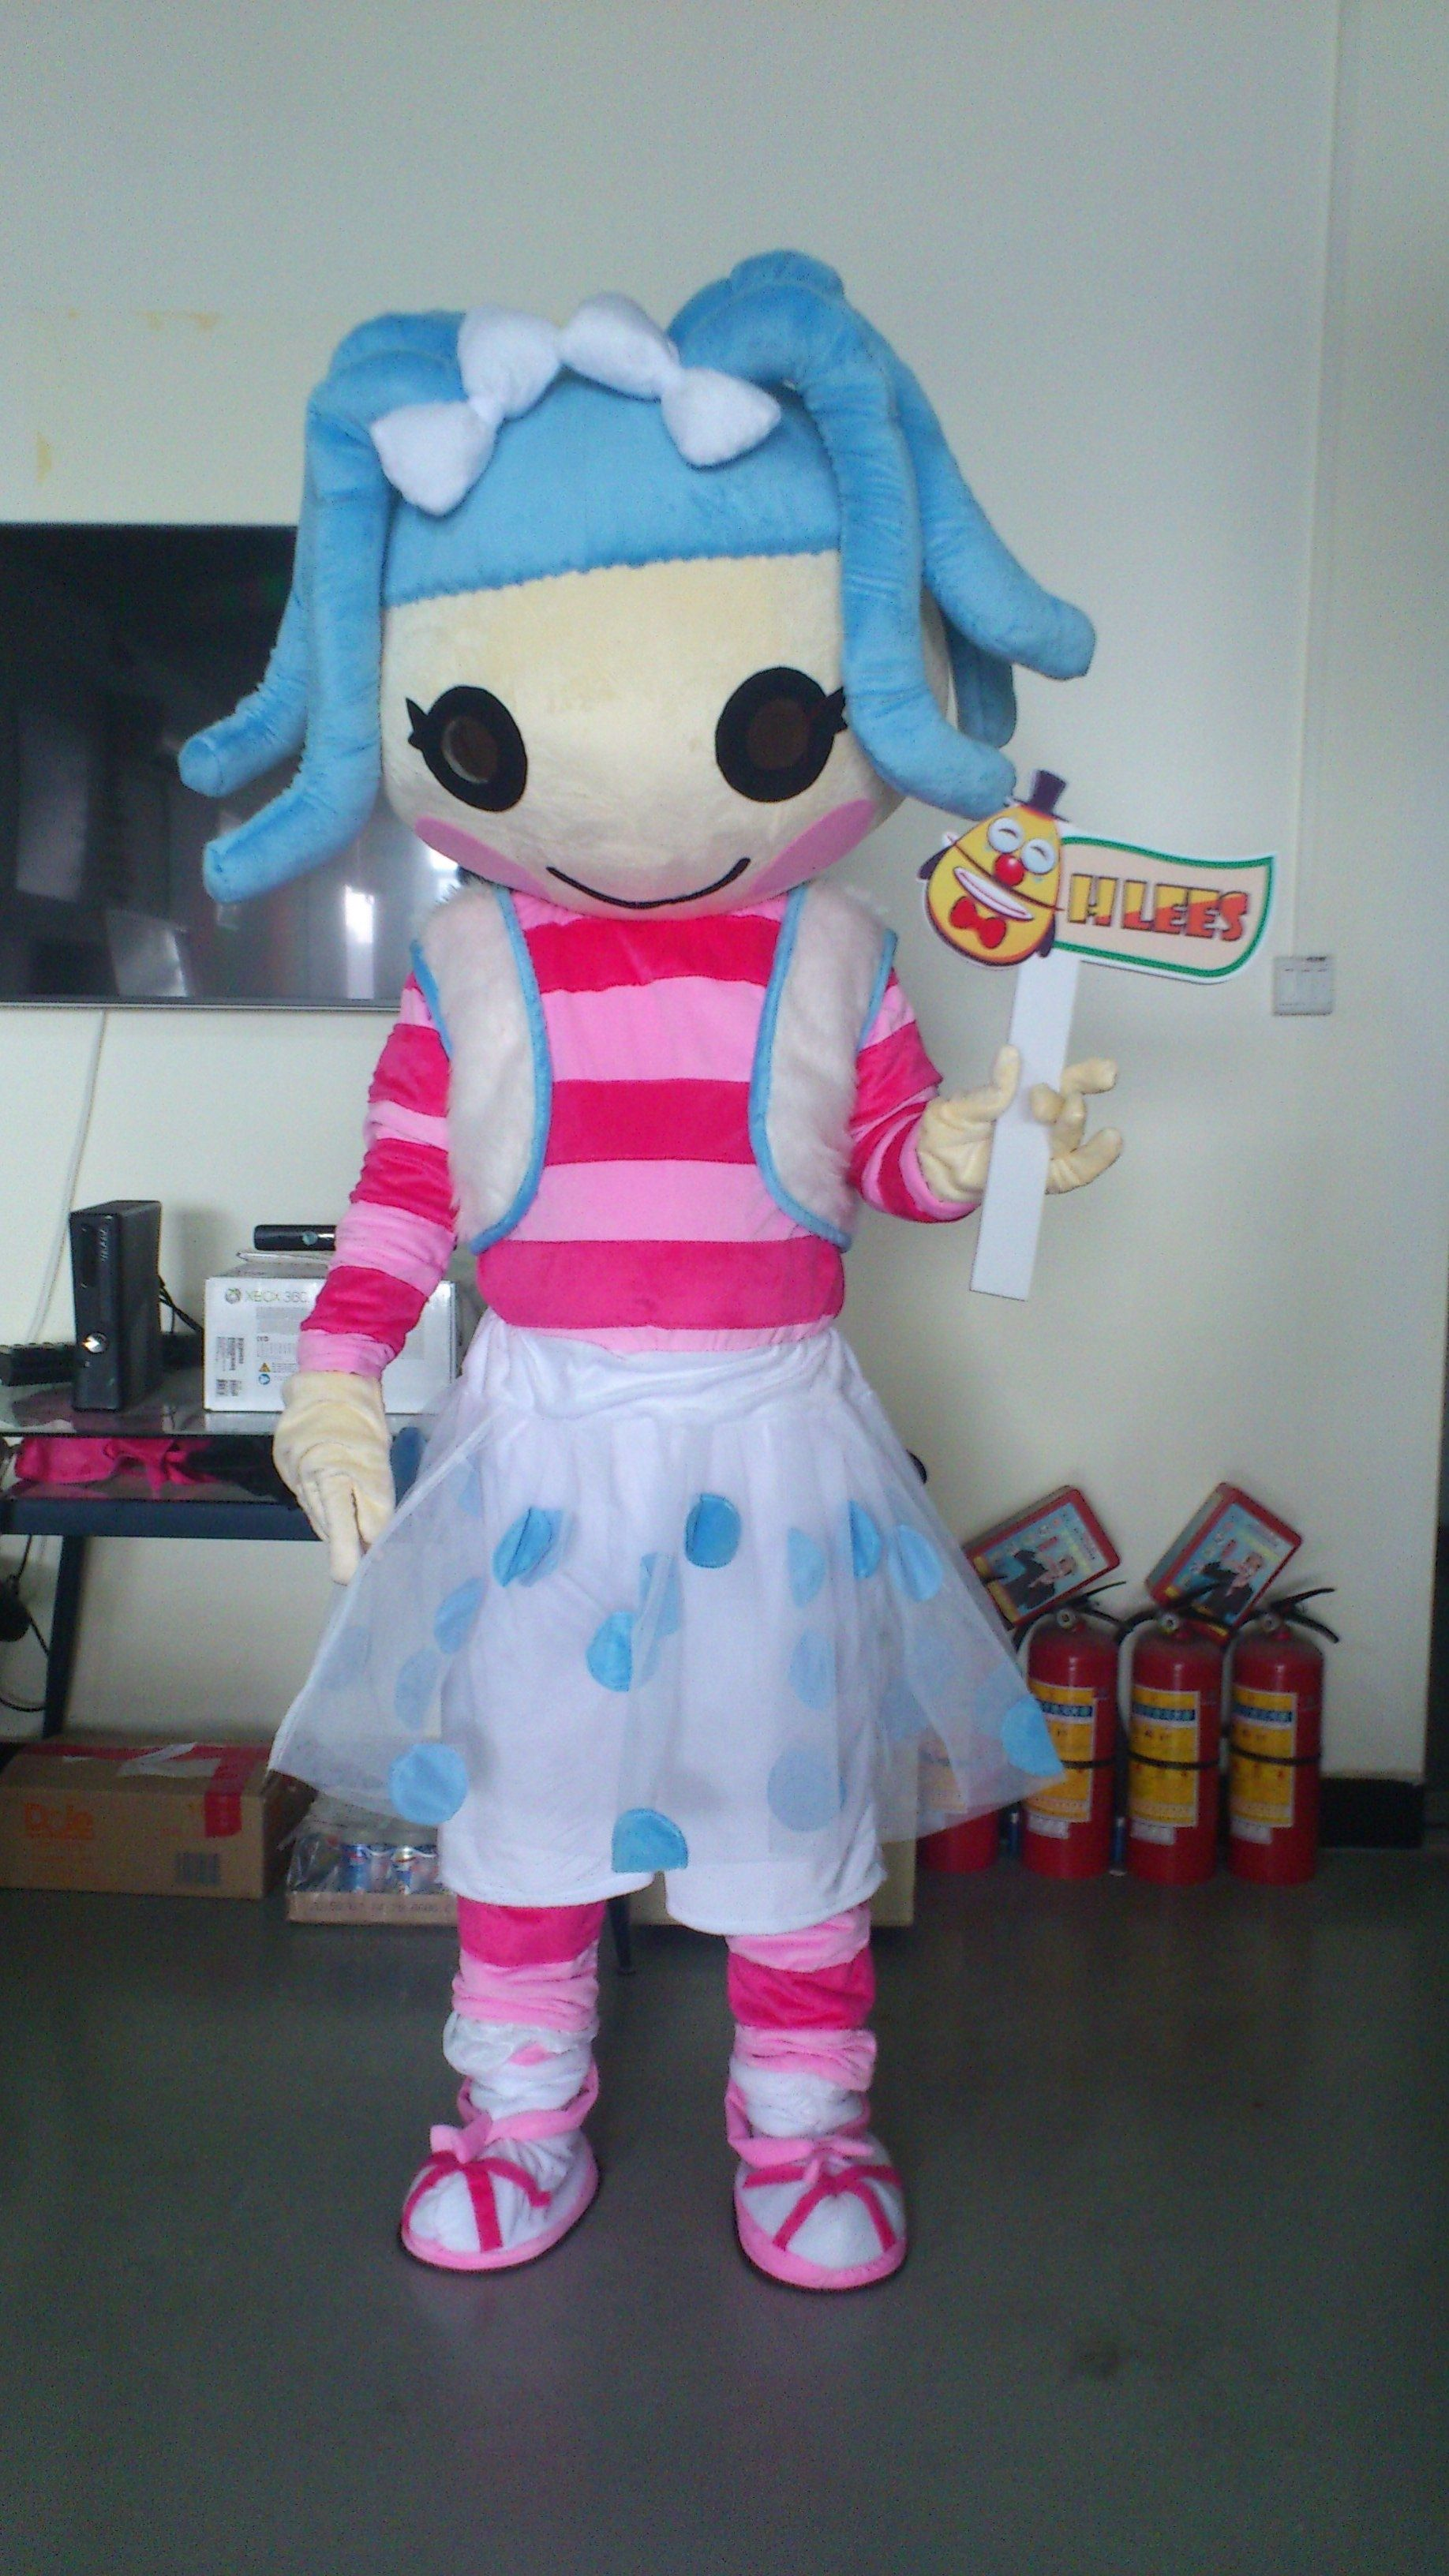 Lalaloopsy Jewel Sparkles Mascot Costumes | Custom College Mascots ...